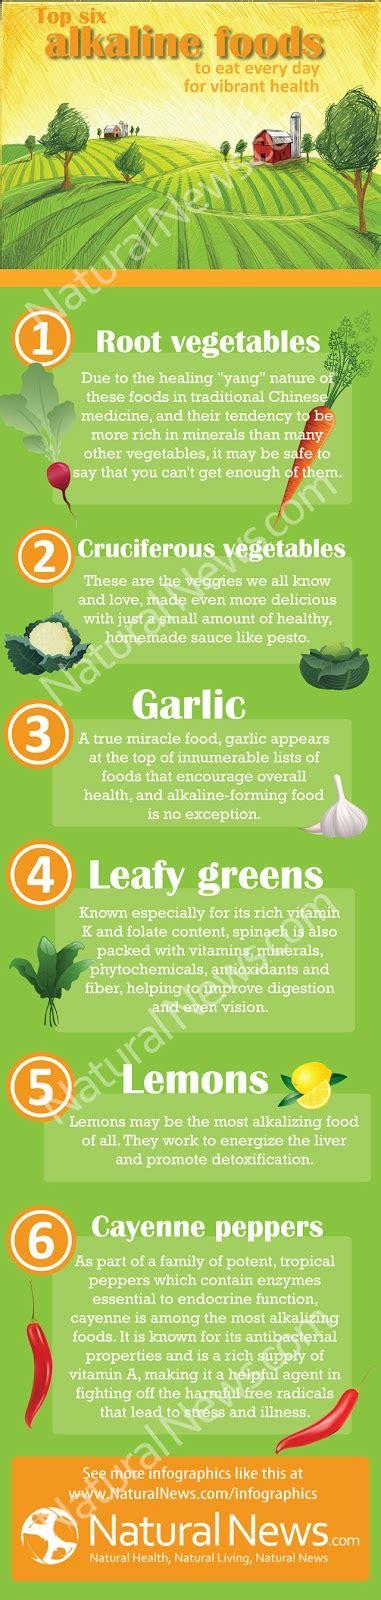 6 weight loss power vegetables diet infographic top 6 alkaline foods